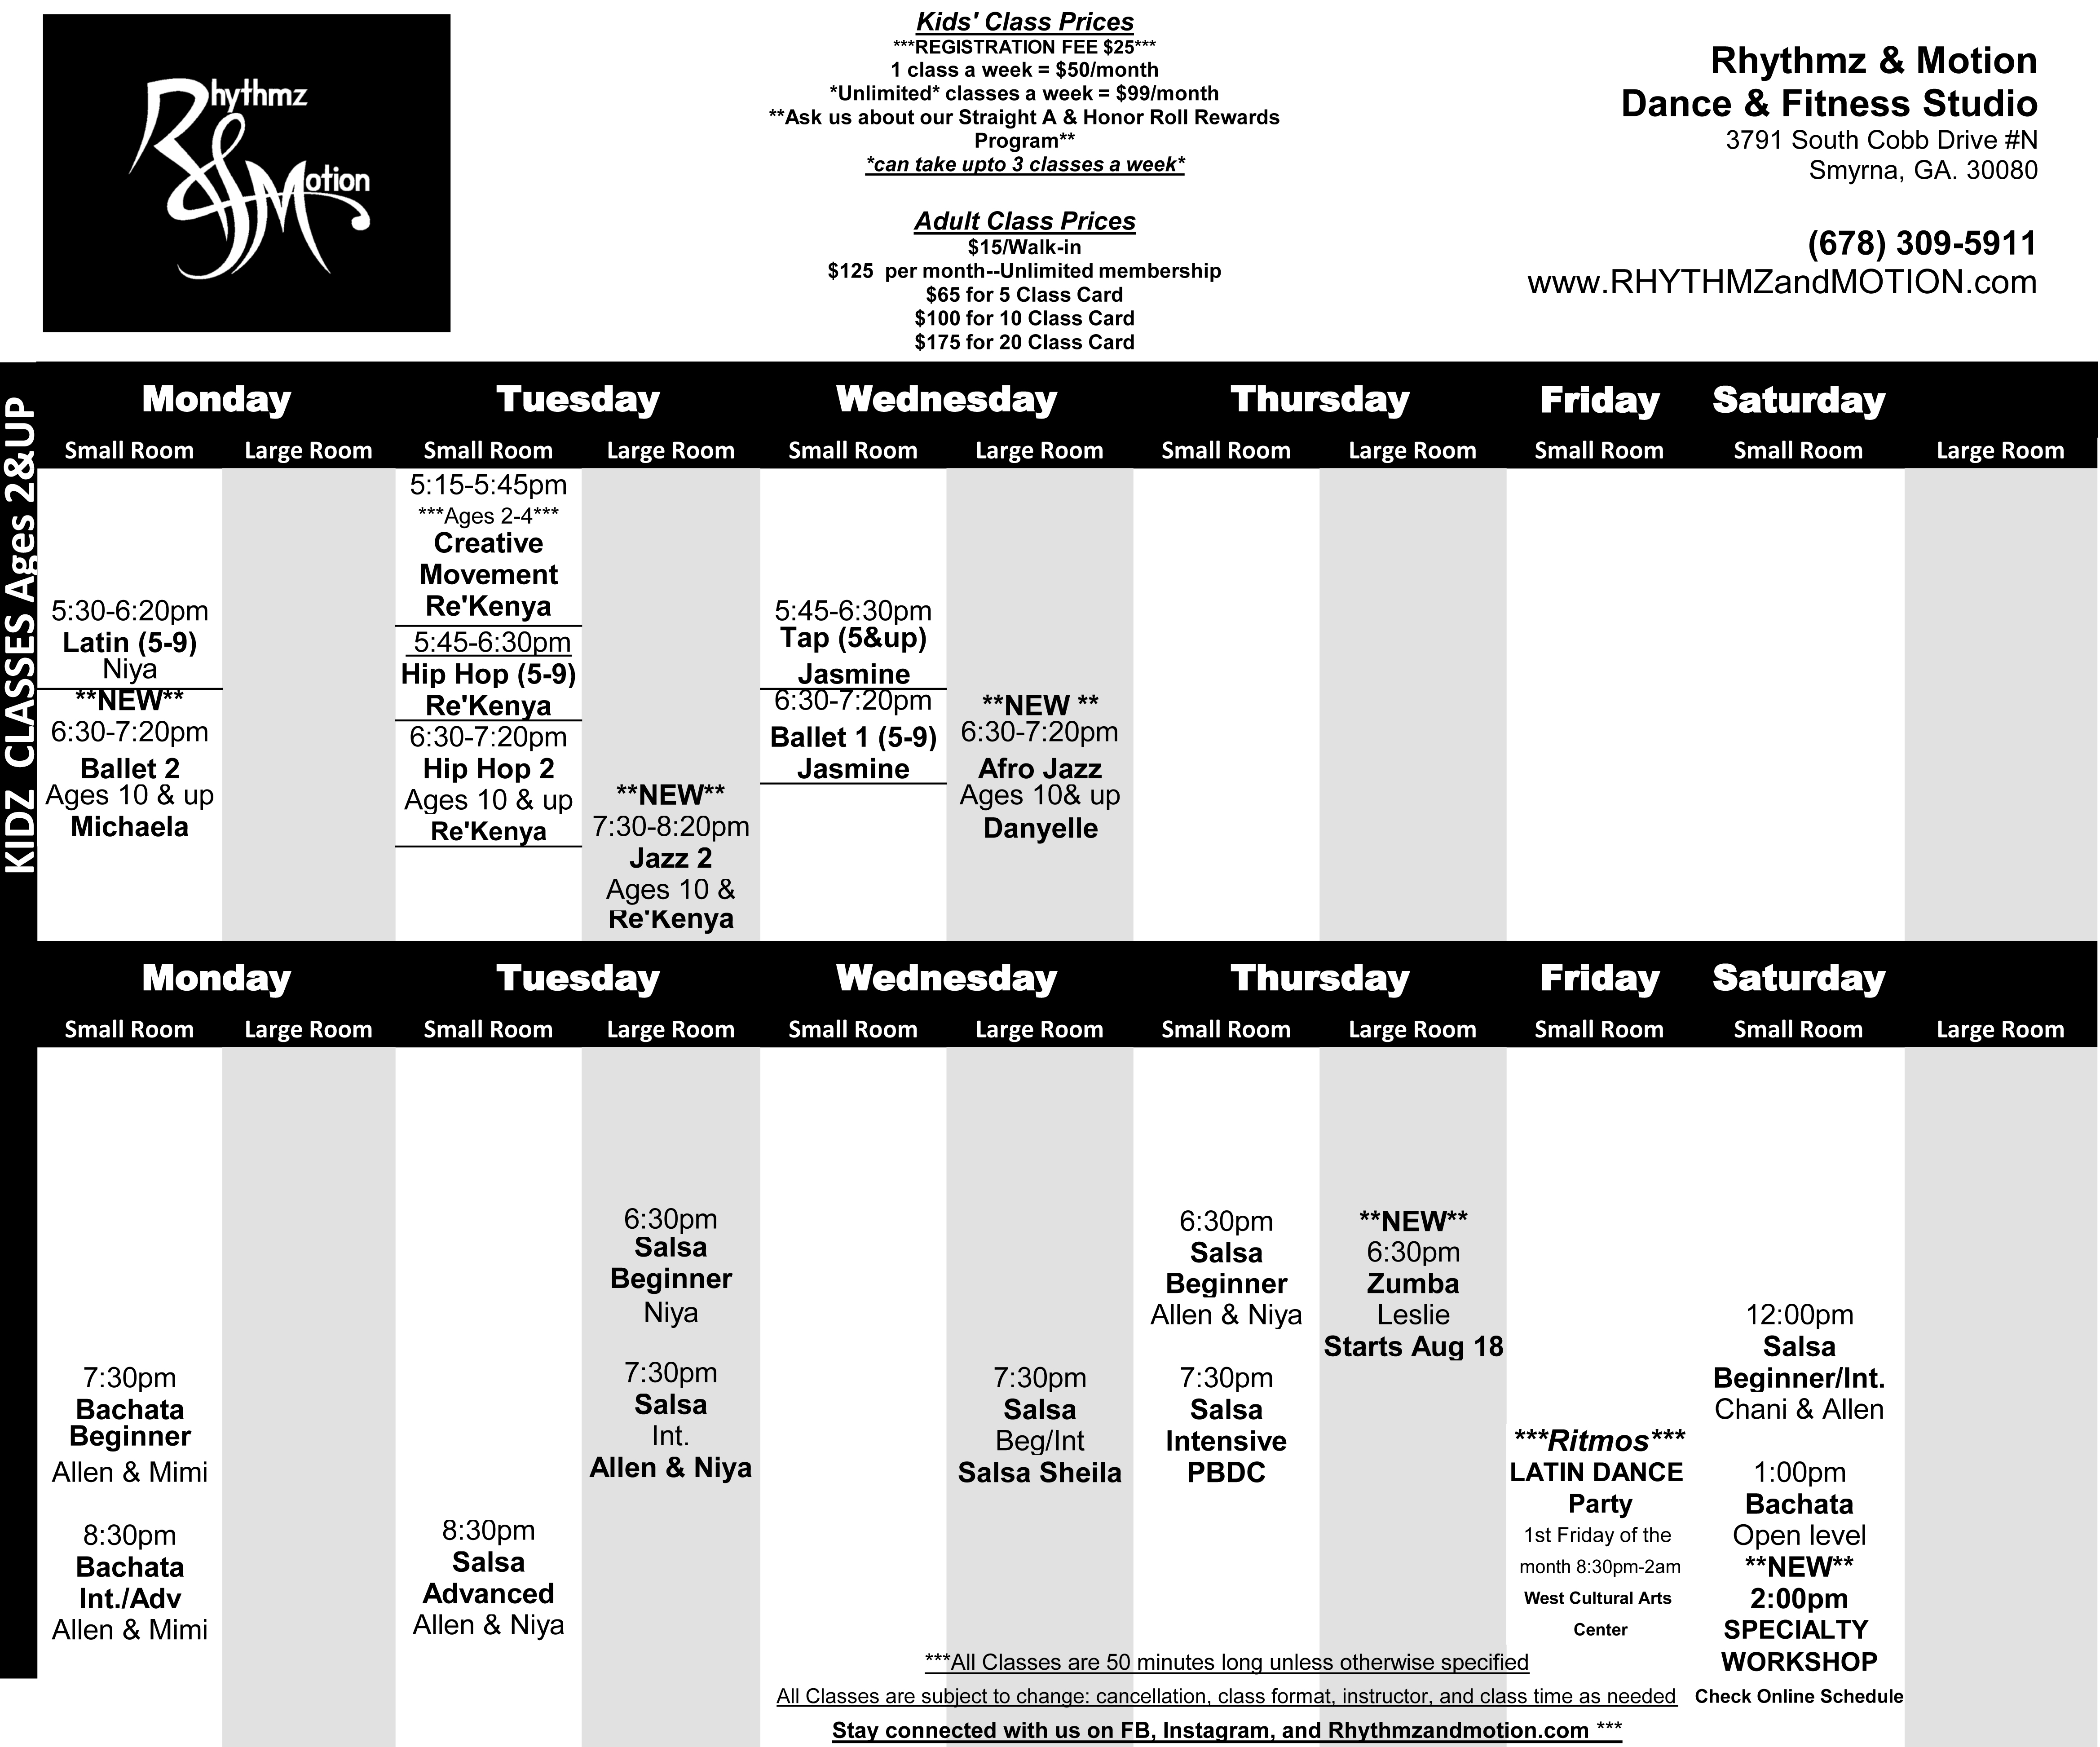 R&M Studio Schedule 2016 BLACK & WHITE (1)